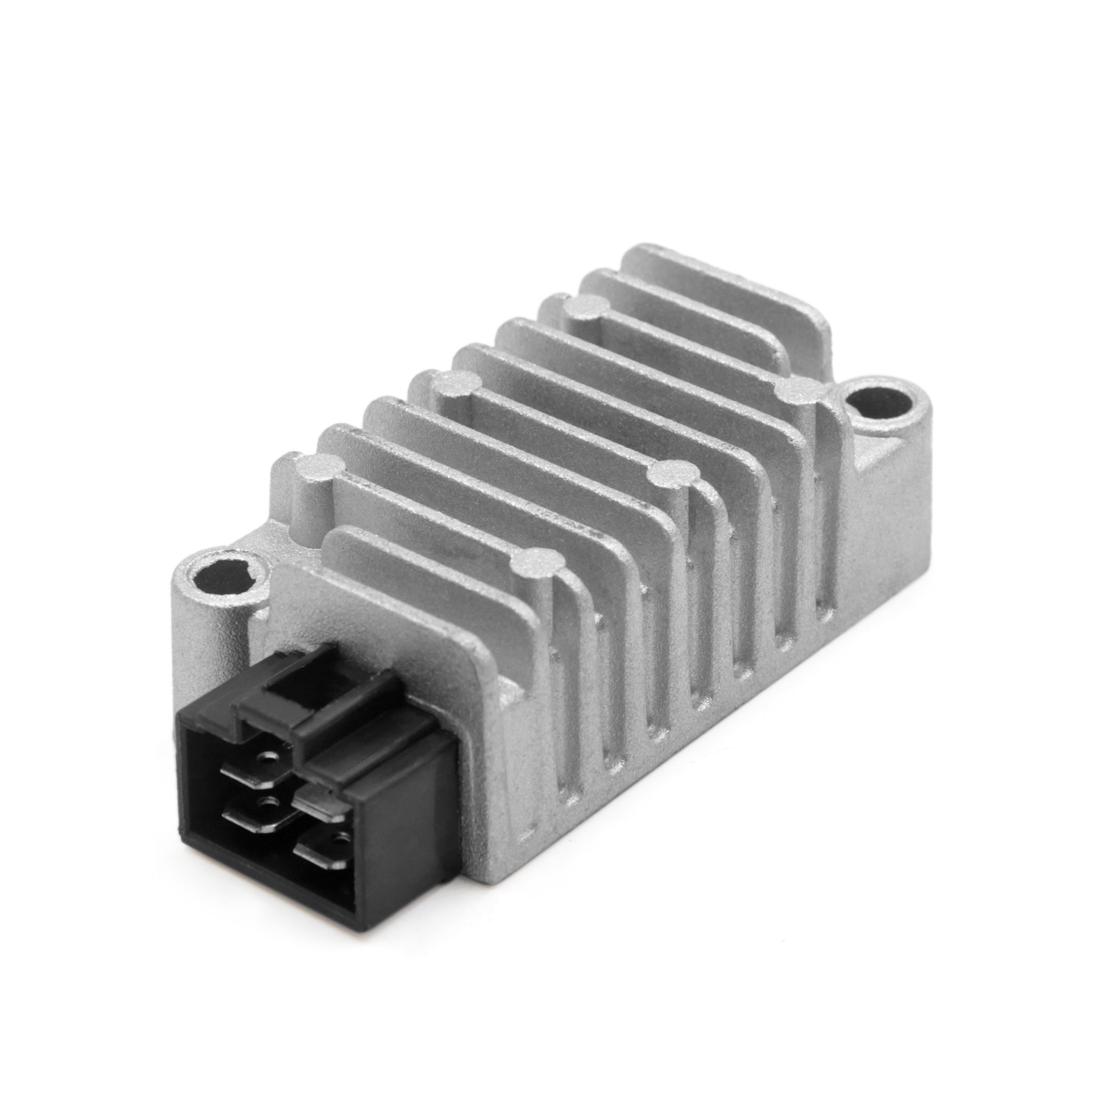 3TJ-81960-02-00 Voltage Regulator Rectifier for Yamaha XT225 XT250 Serow